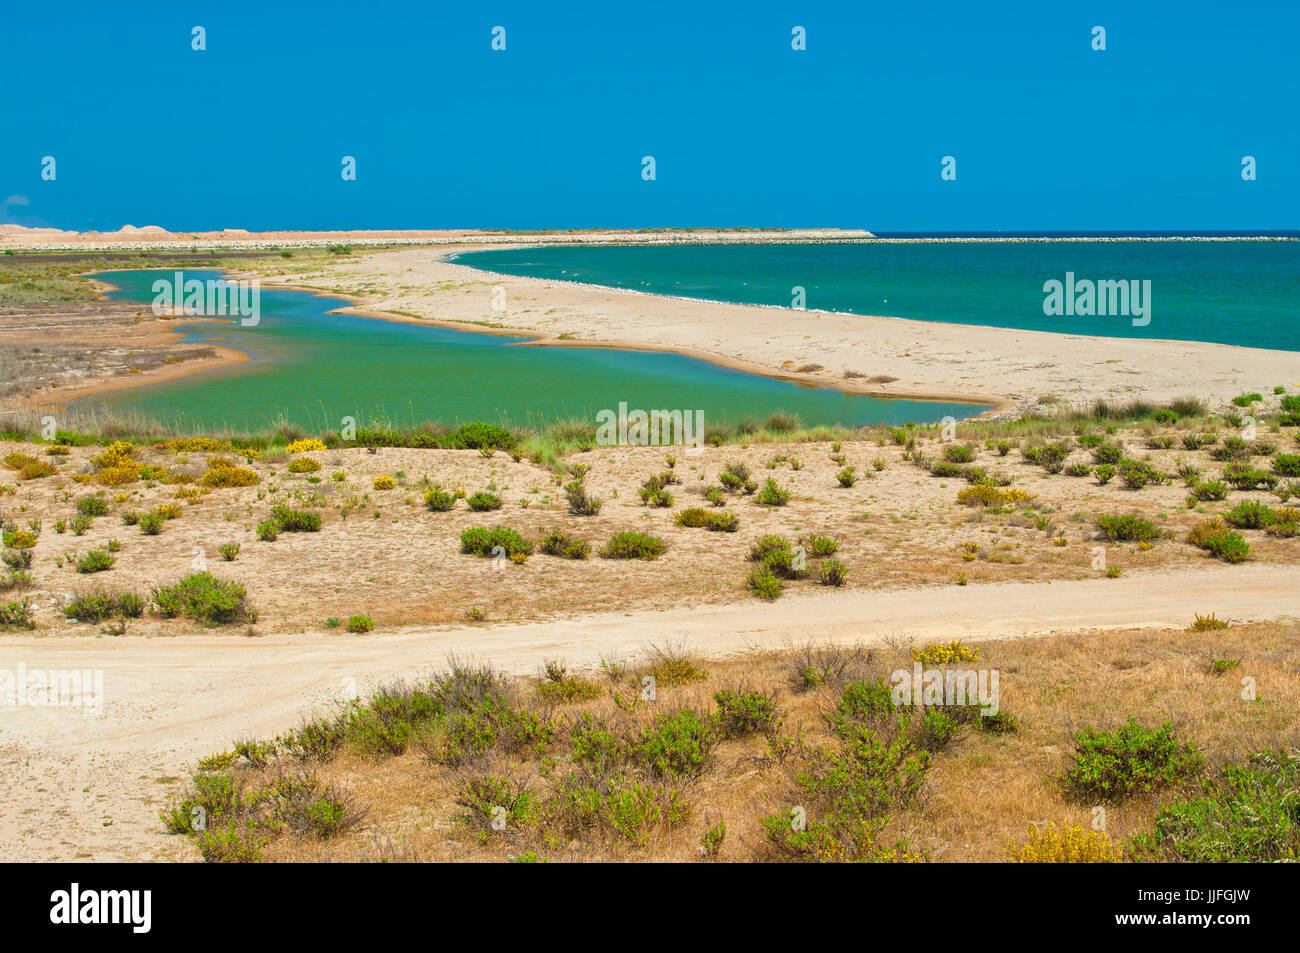 view of Llobregat river delta and Mediterranean sea beach on sunny summer day in El Prat, Barcelona, Catalonia, - Stock Image